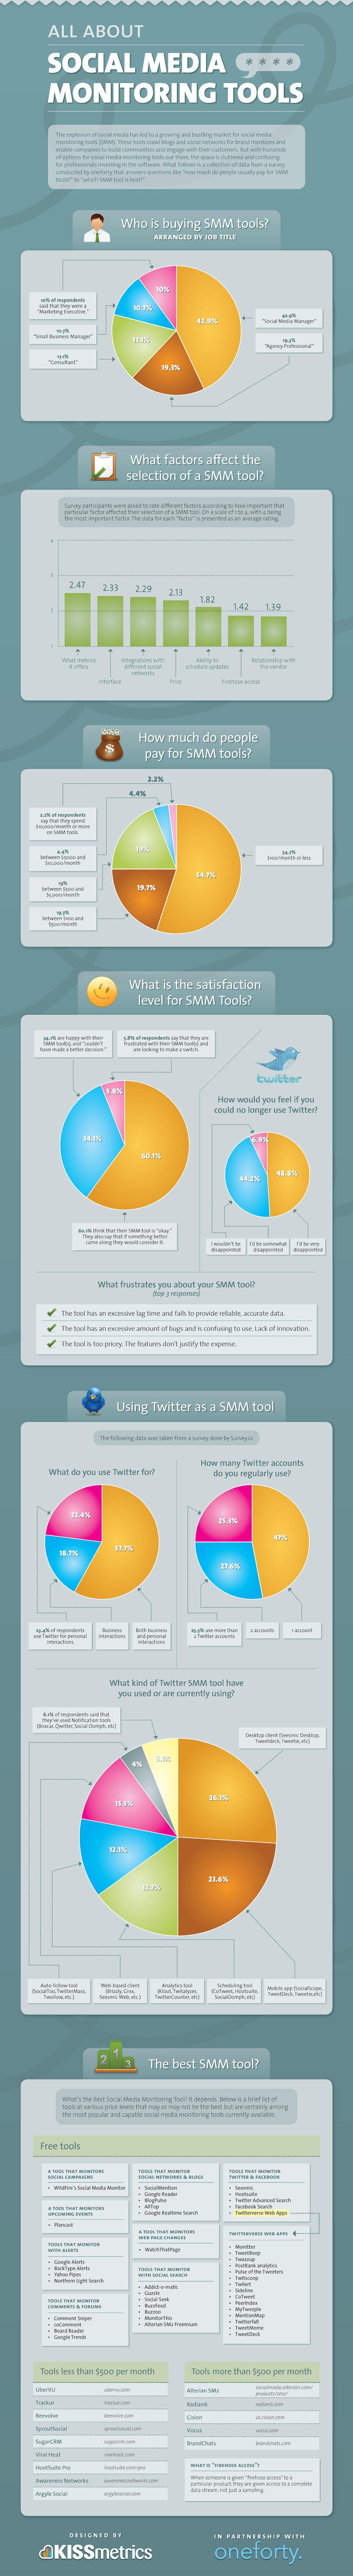 herramientas-social-media